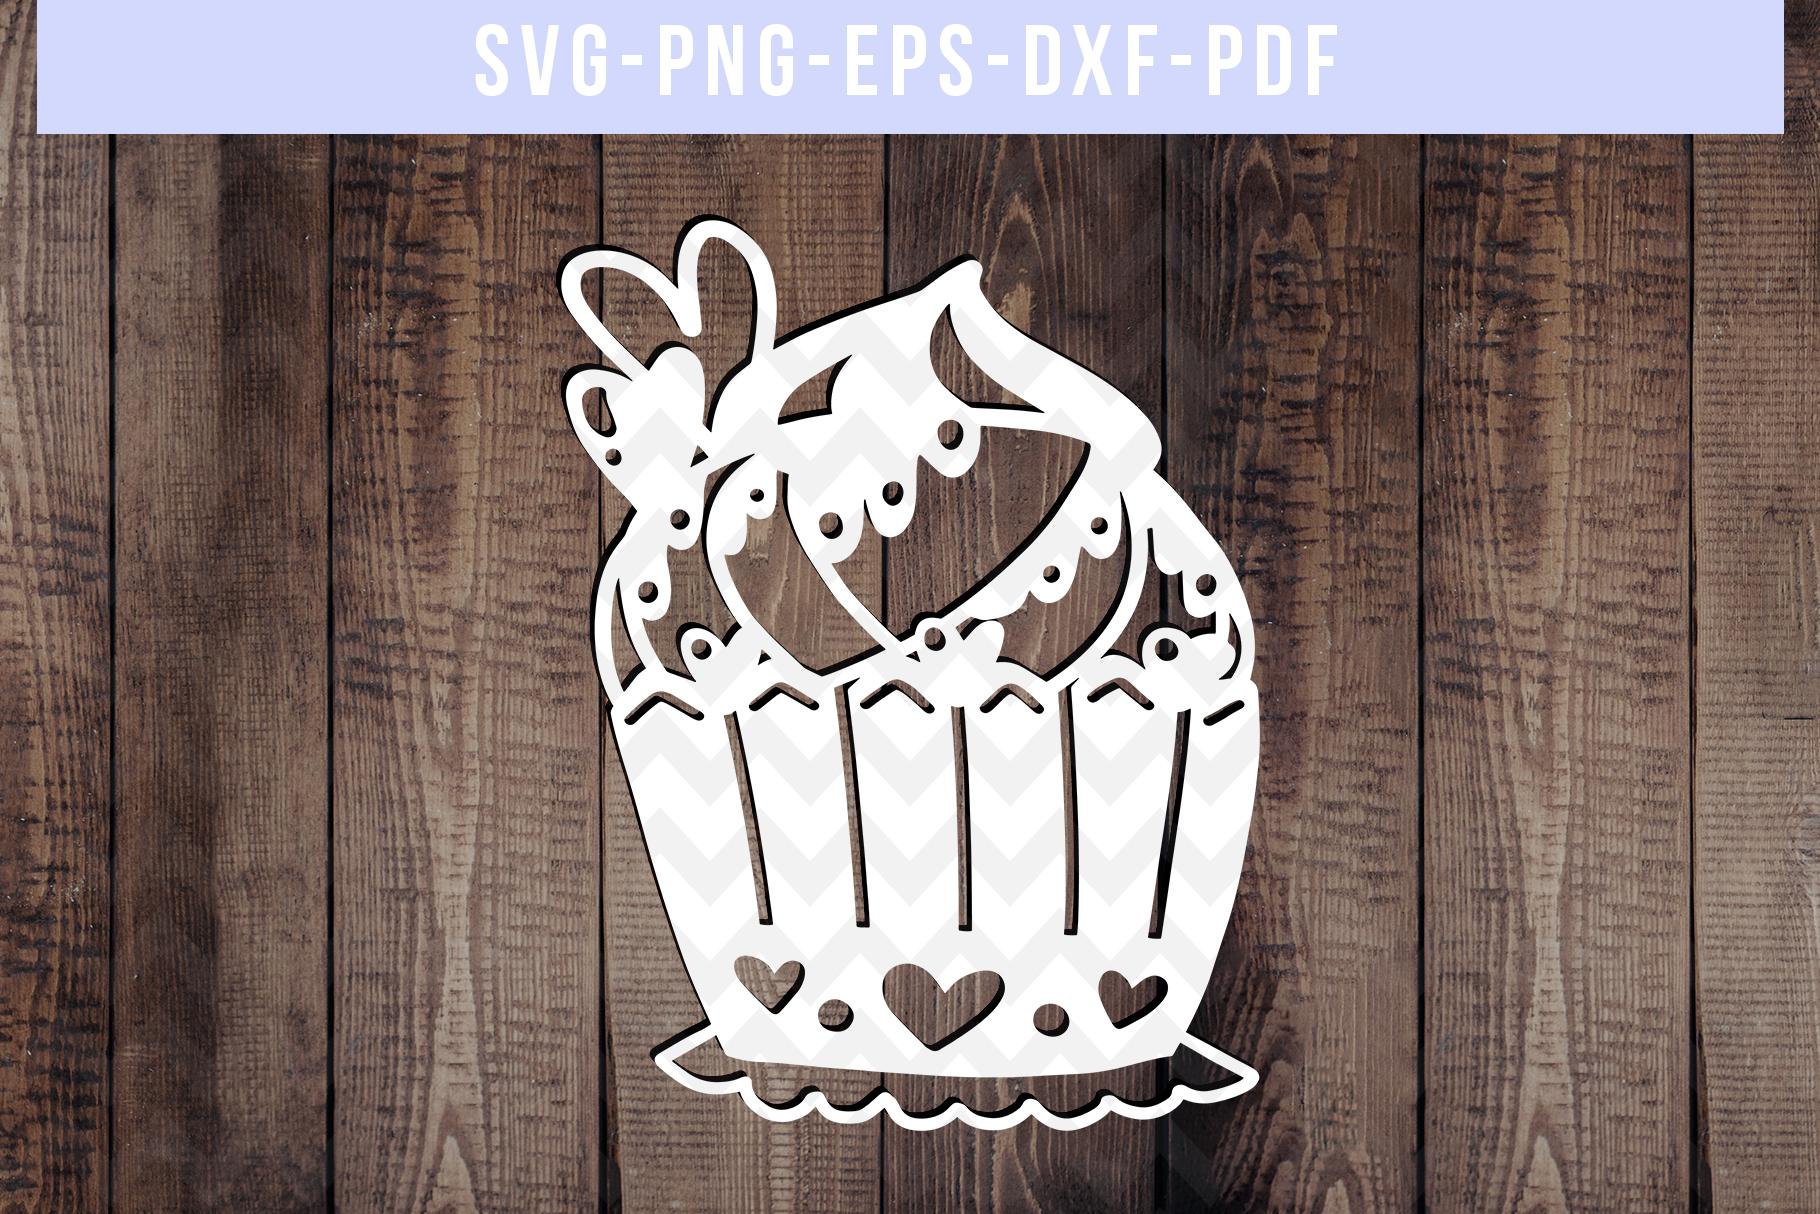 Bundle Of 9 Cupcake Papercut Templates, SVG Cutting File PDF example image 5